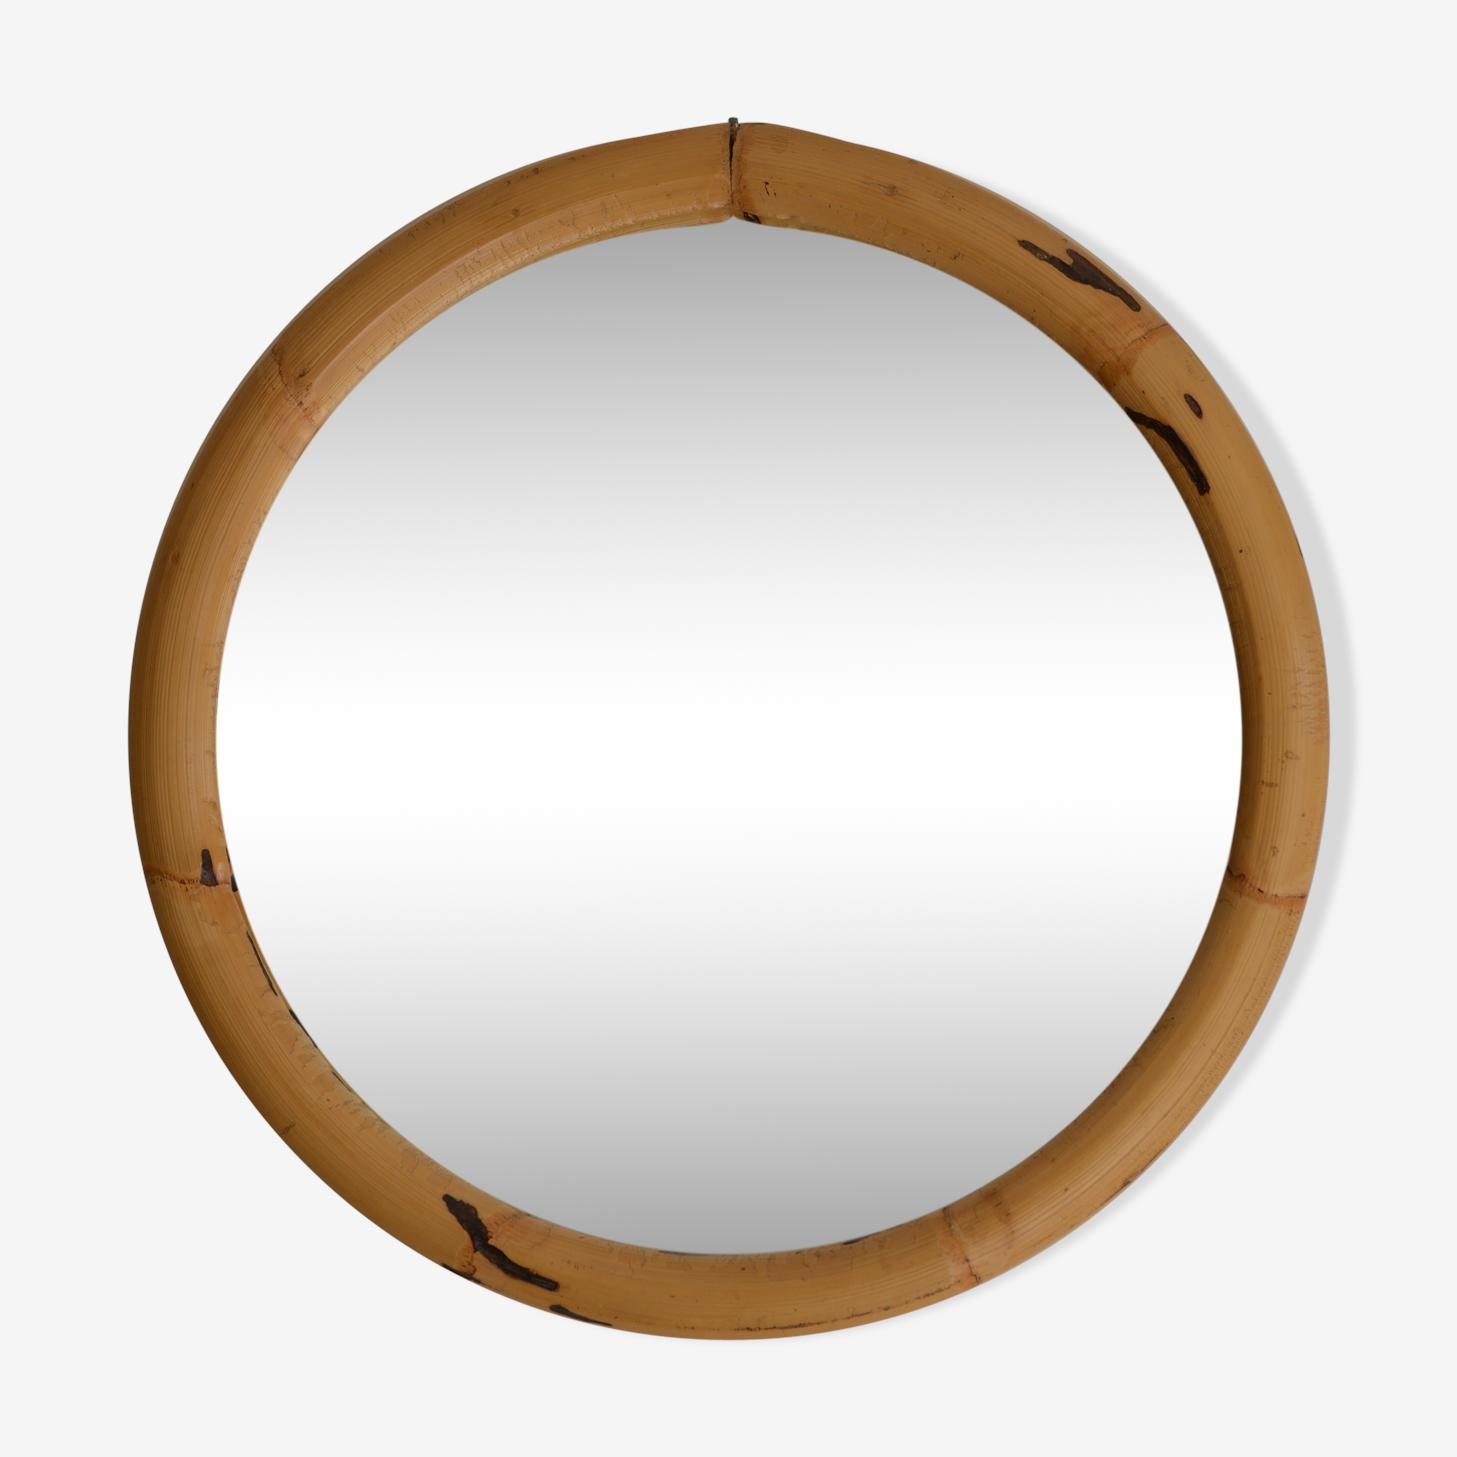 Miroir rotin années 70 44x44cm